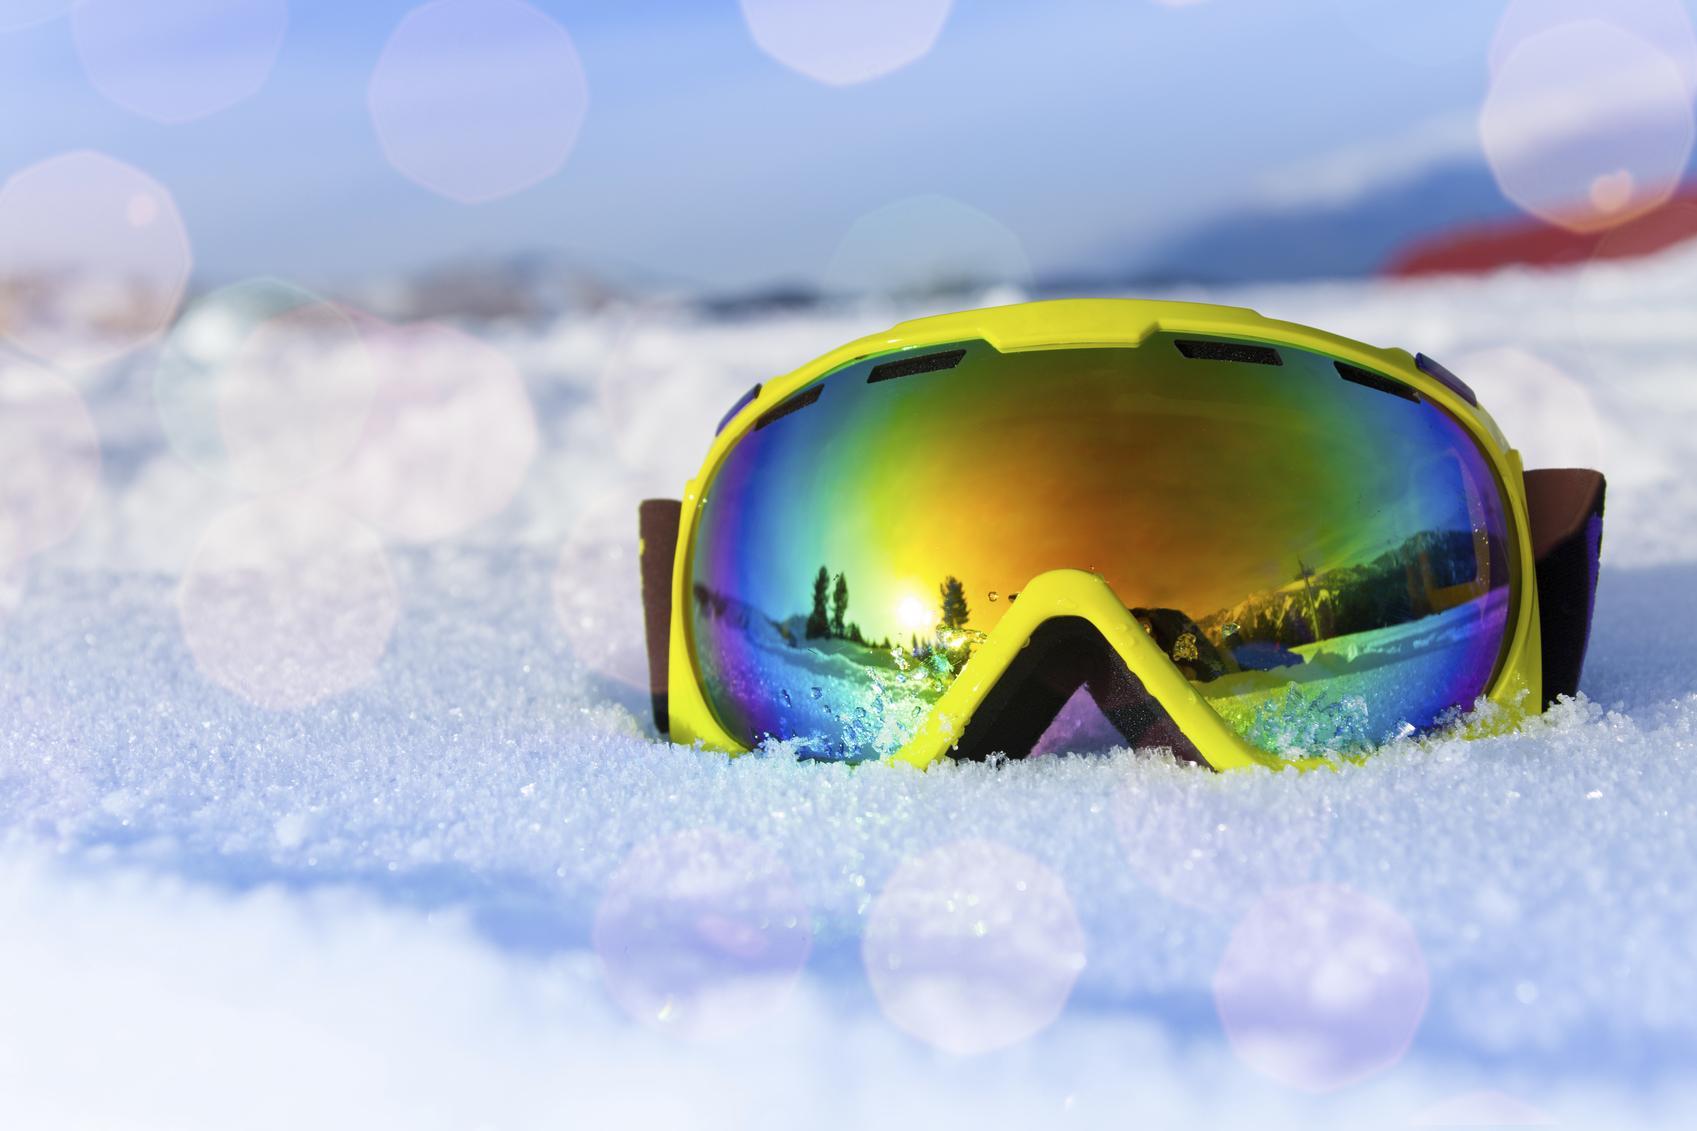 Gafas de esquí sobre suelo nevado